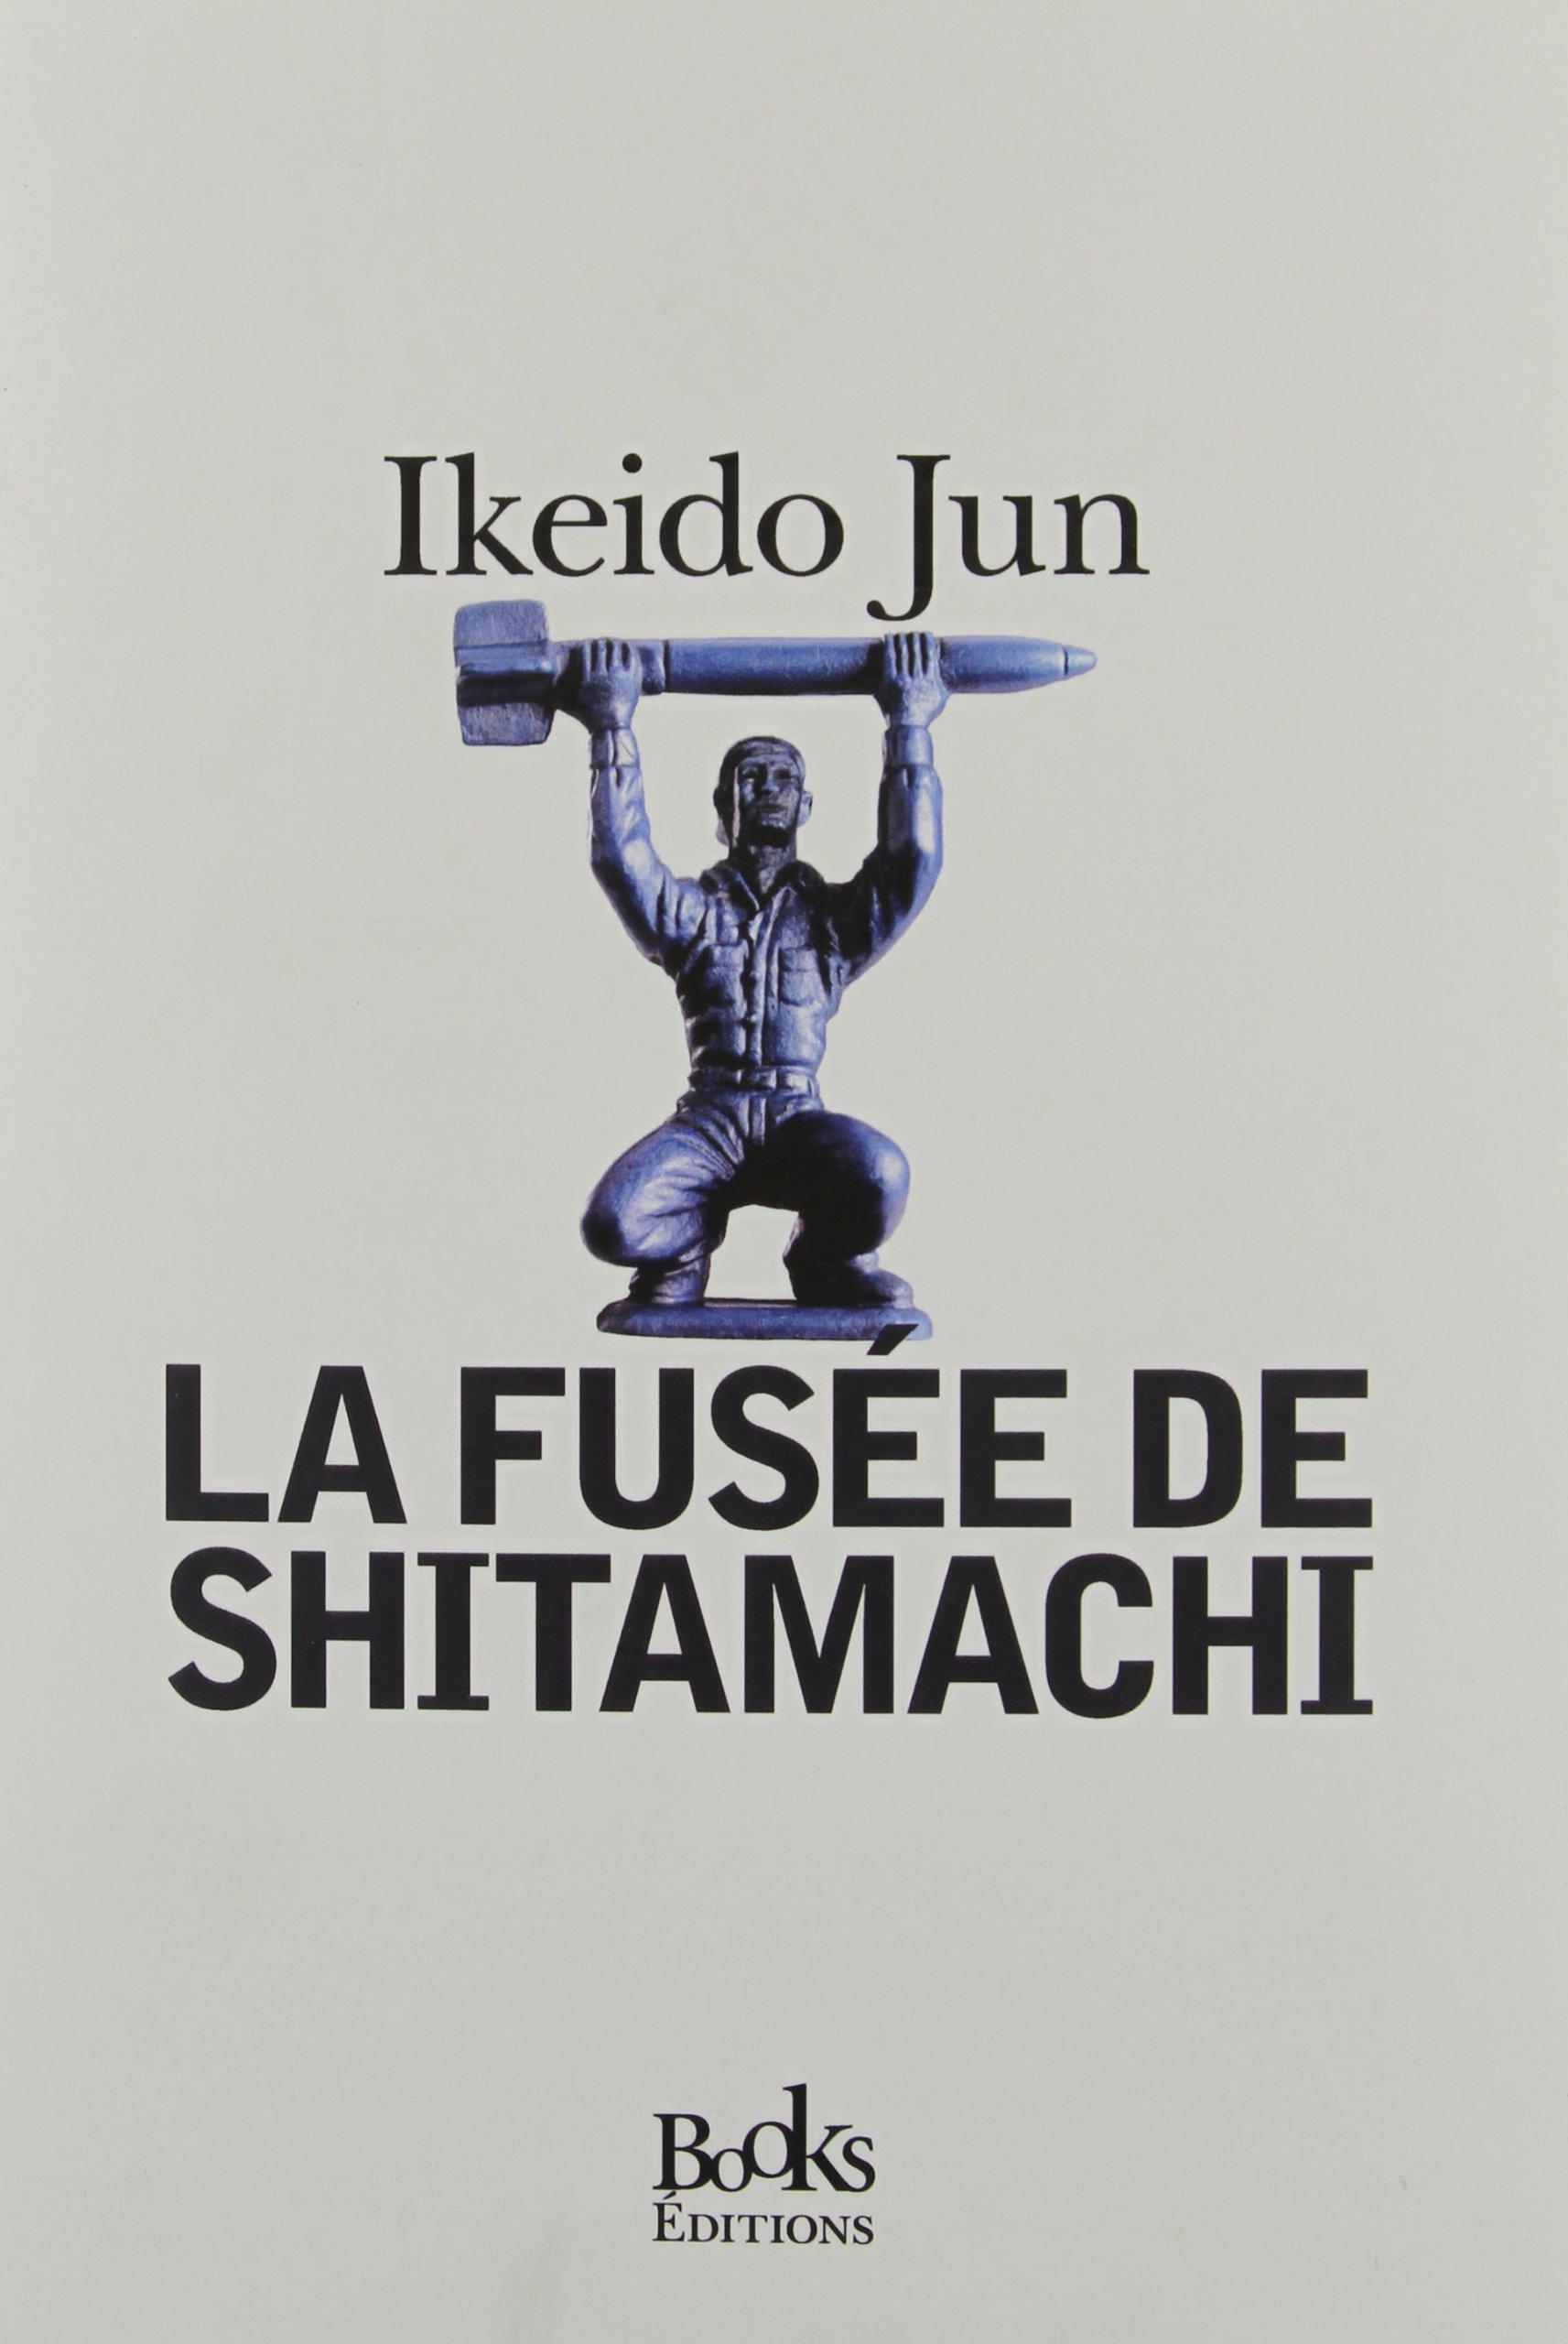 La fusee de Shitamachi - Ikeido Jun